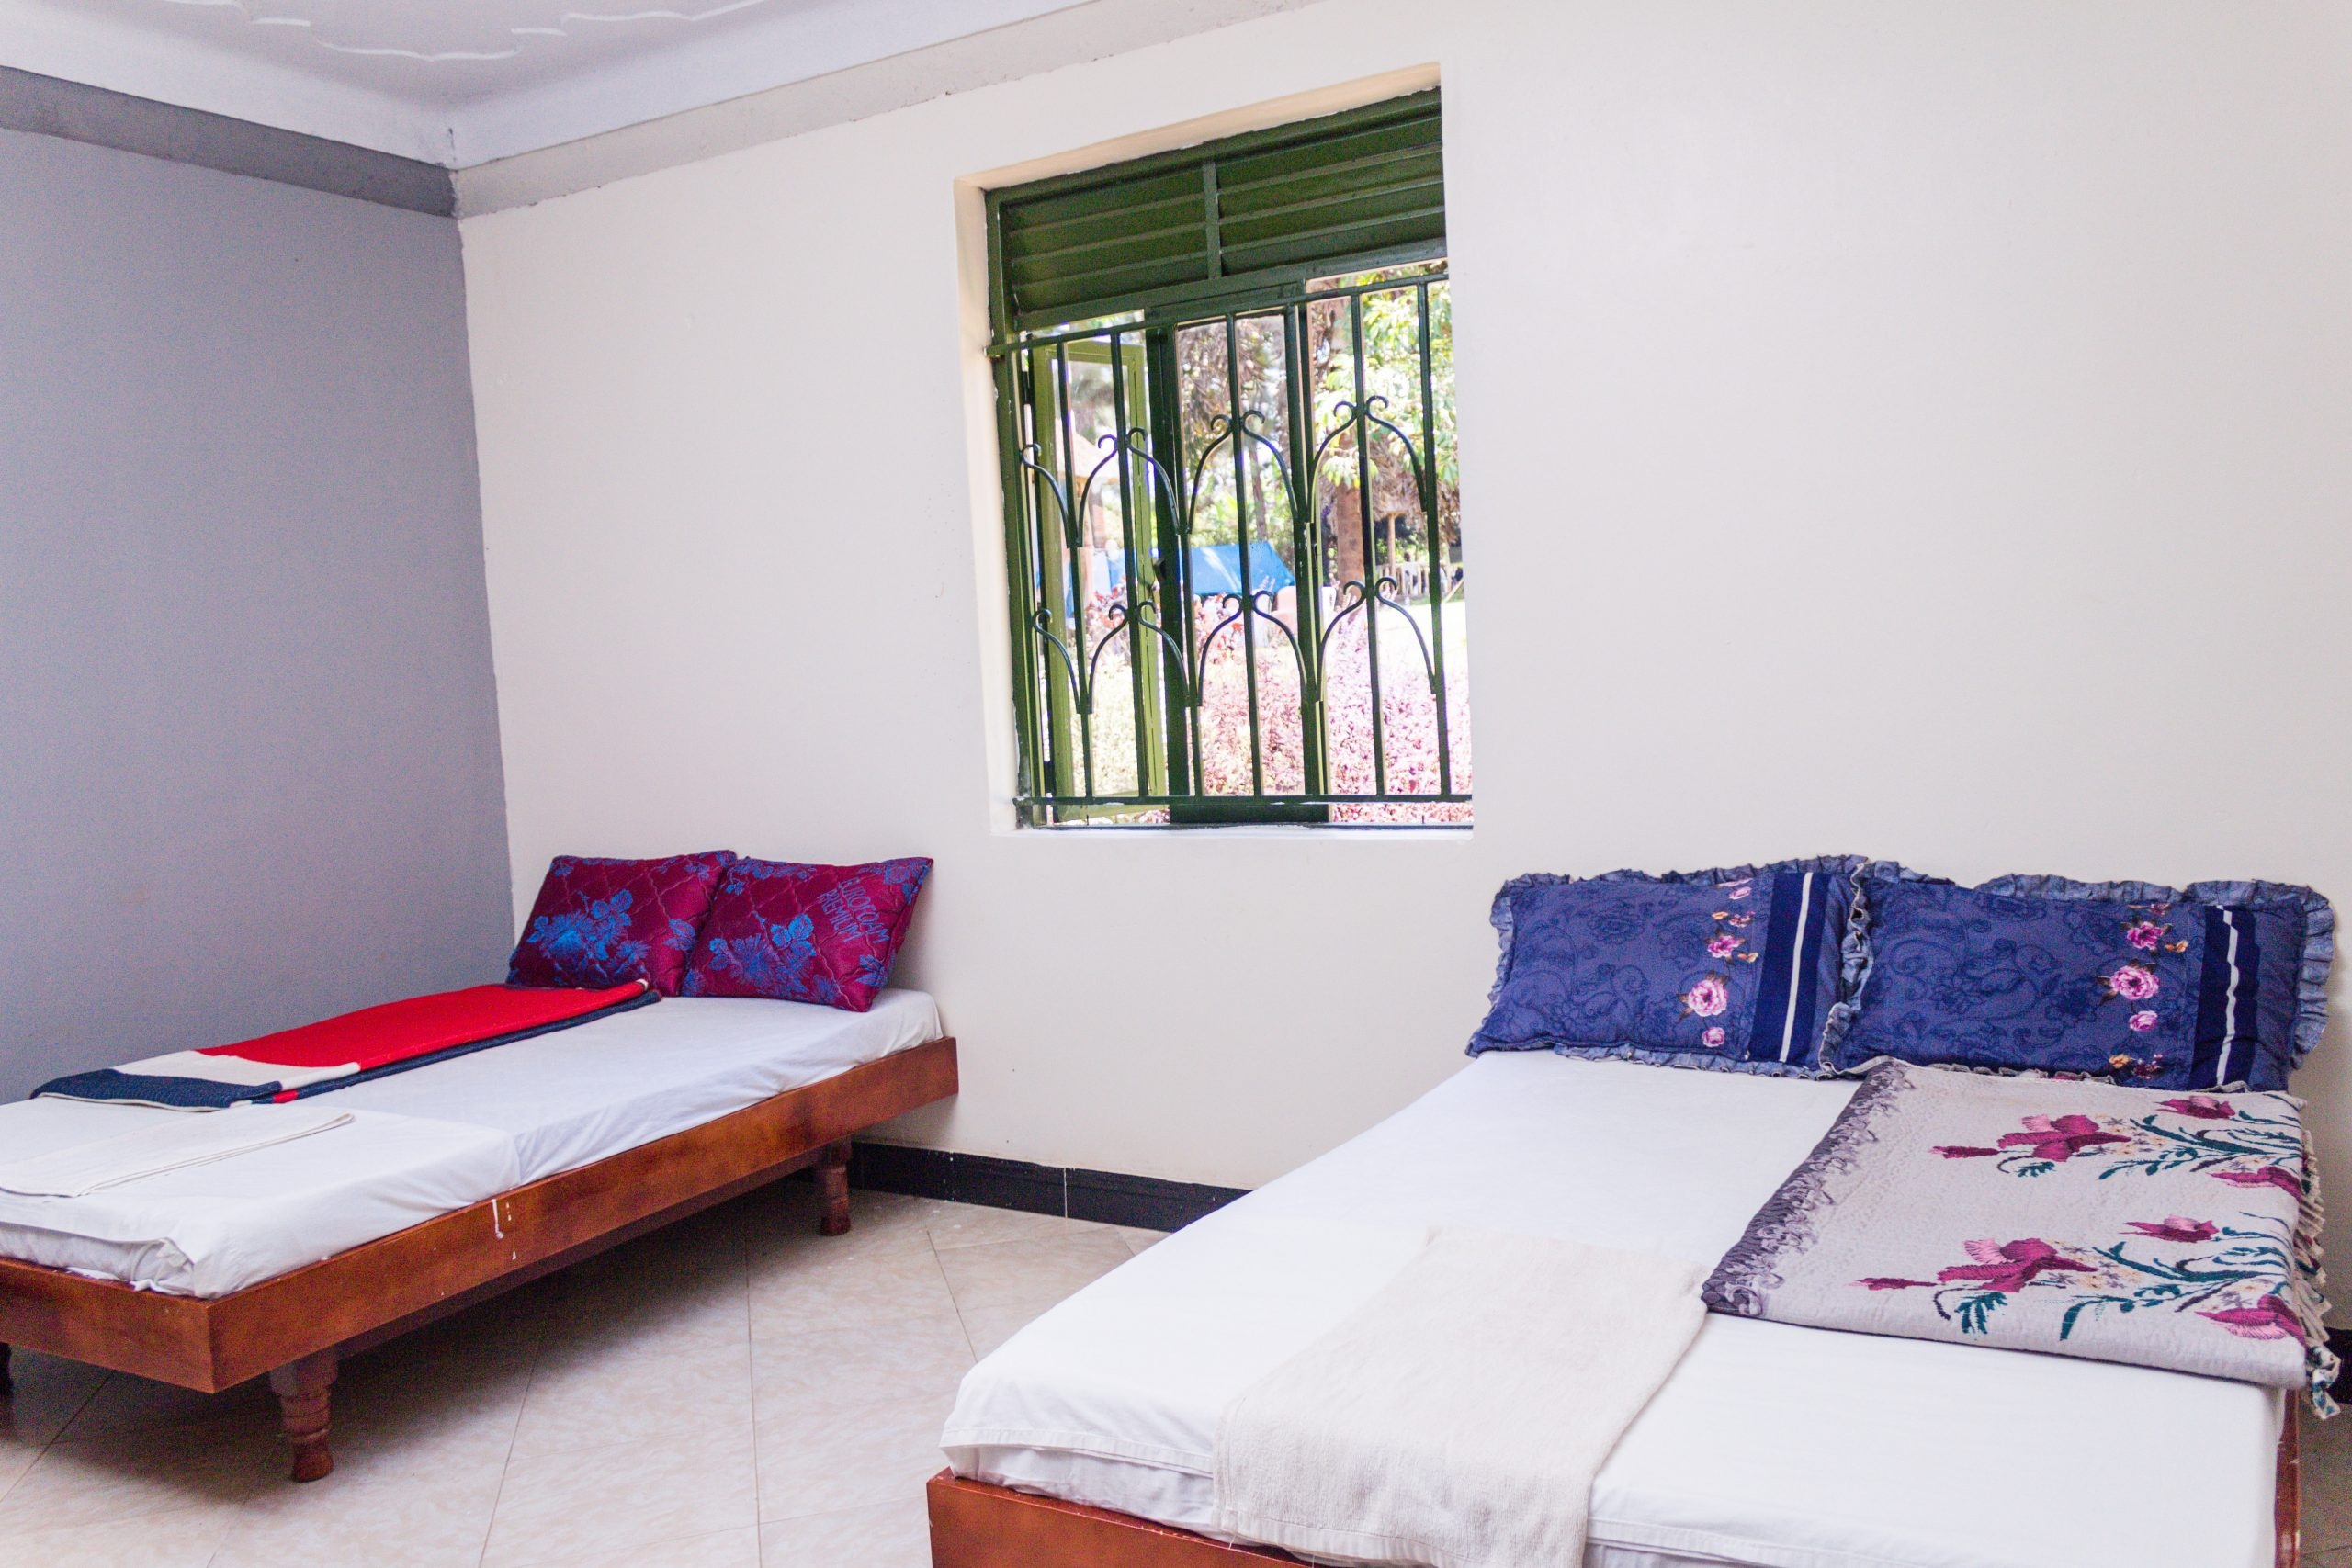 Pine Leisure park Accommodation facility in Entebbe – Uganda.